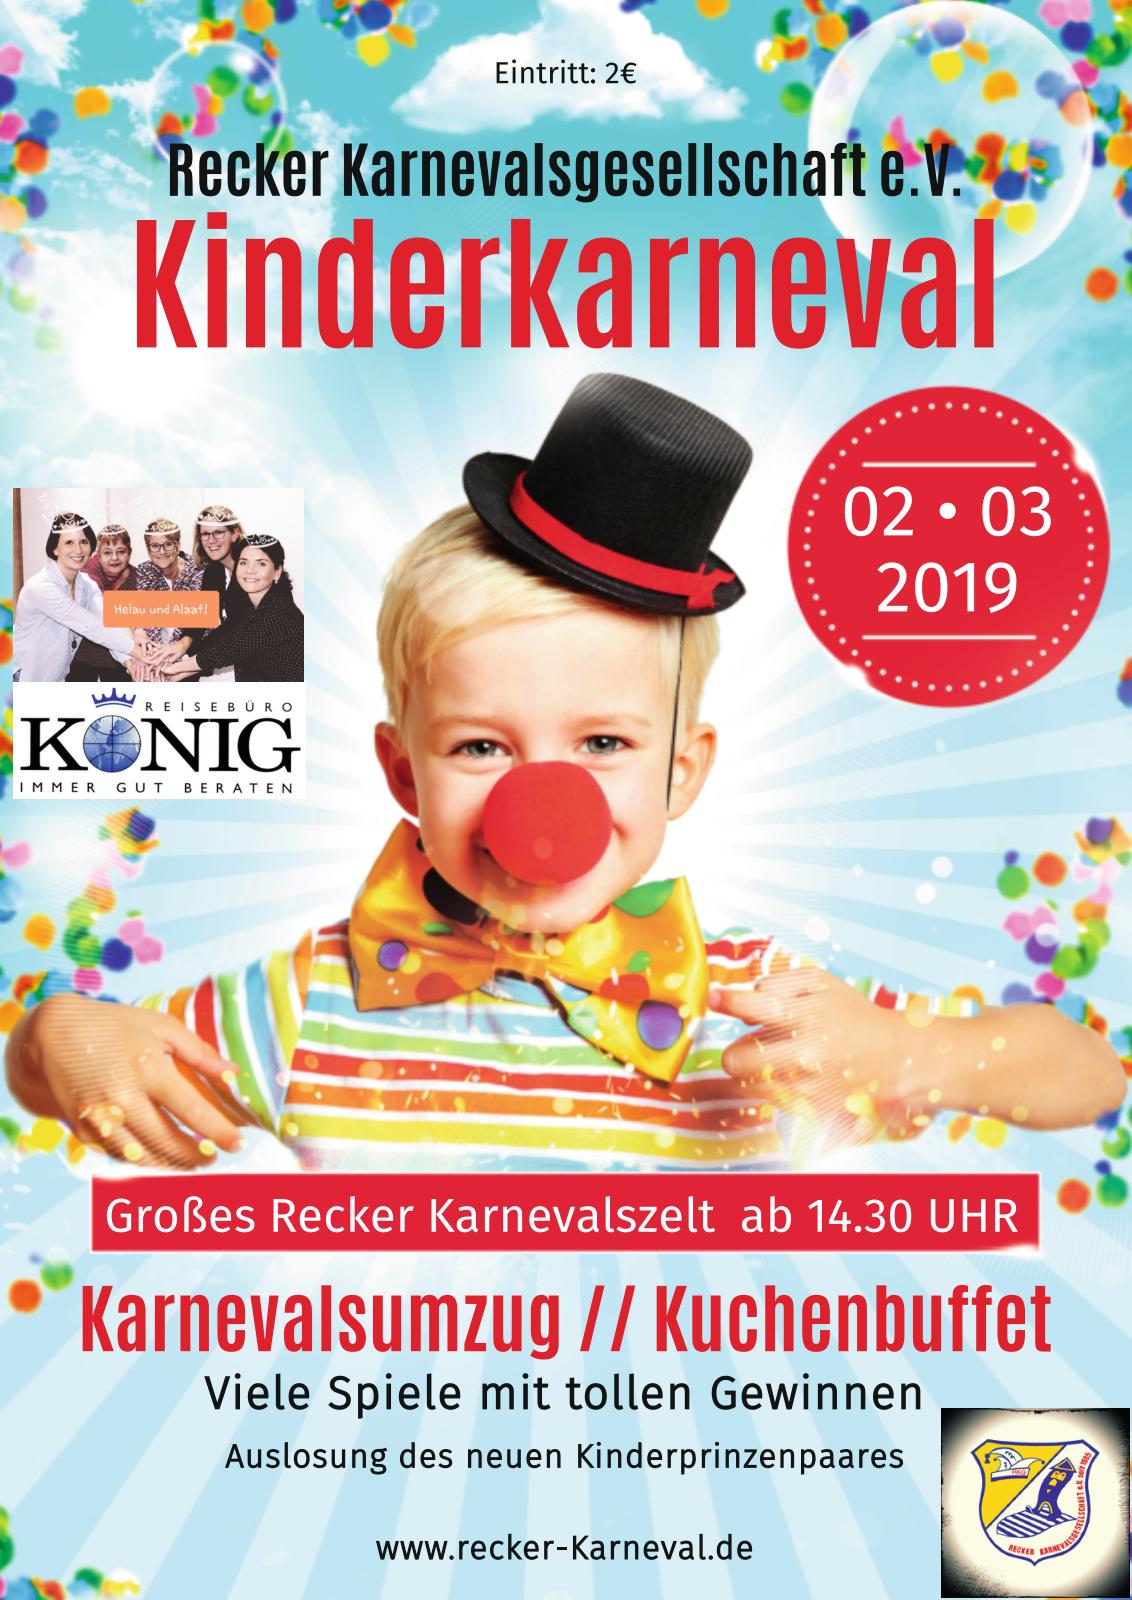 Kinderkarneval 2019 Flyer